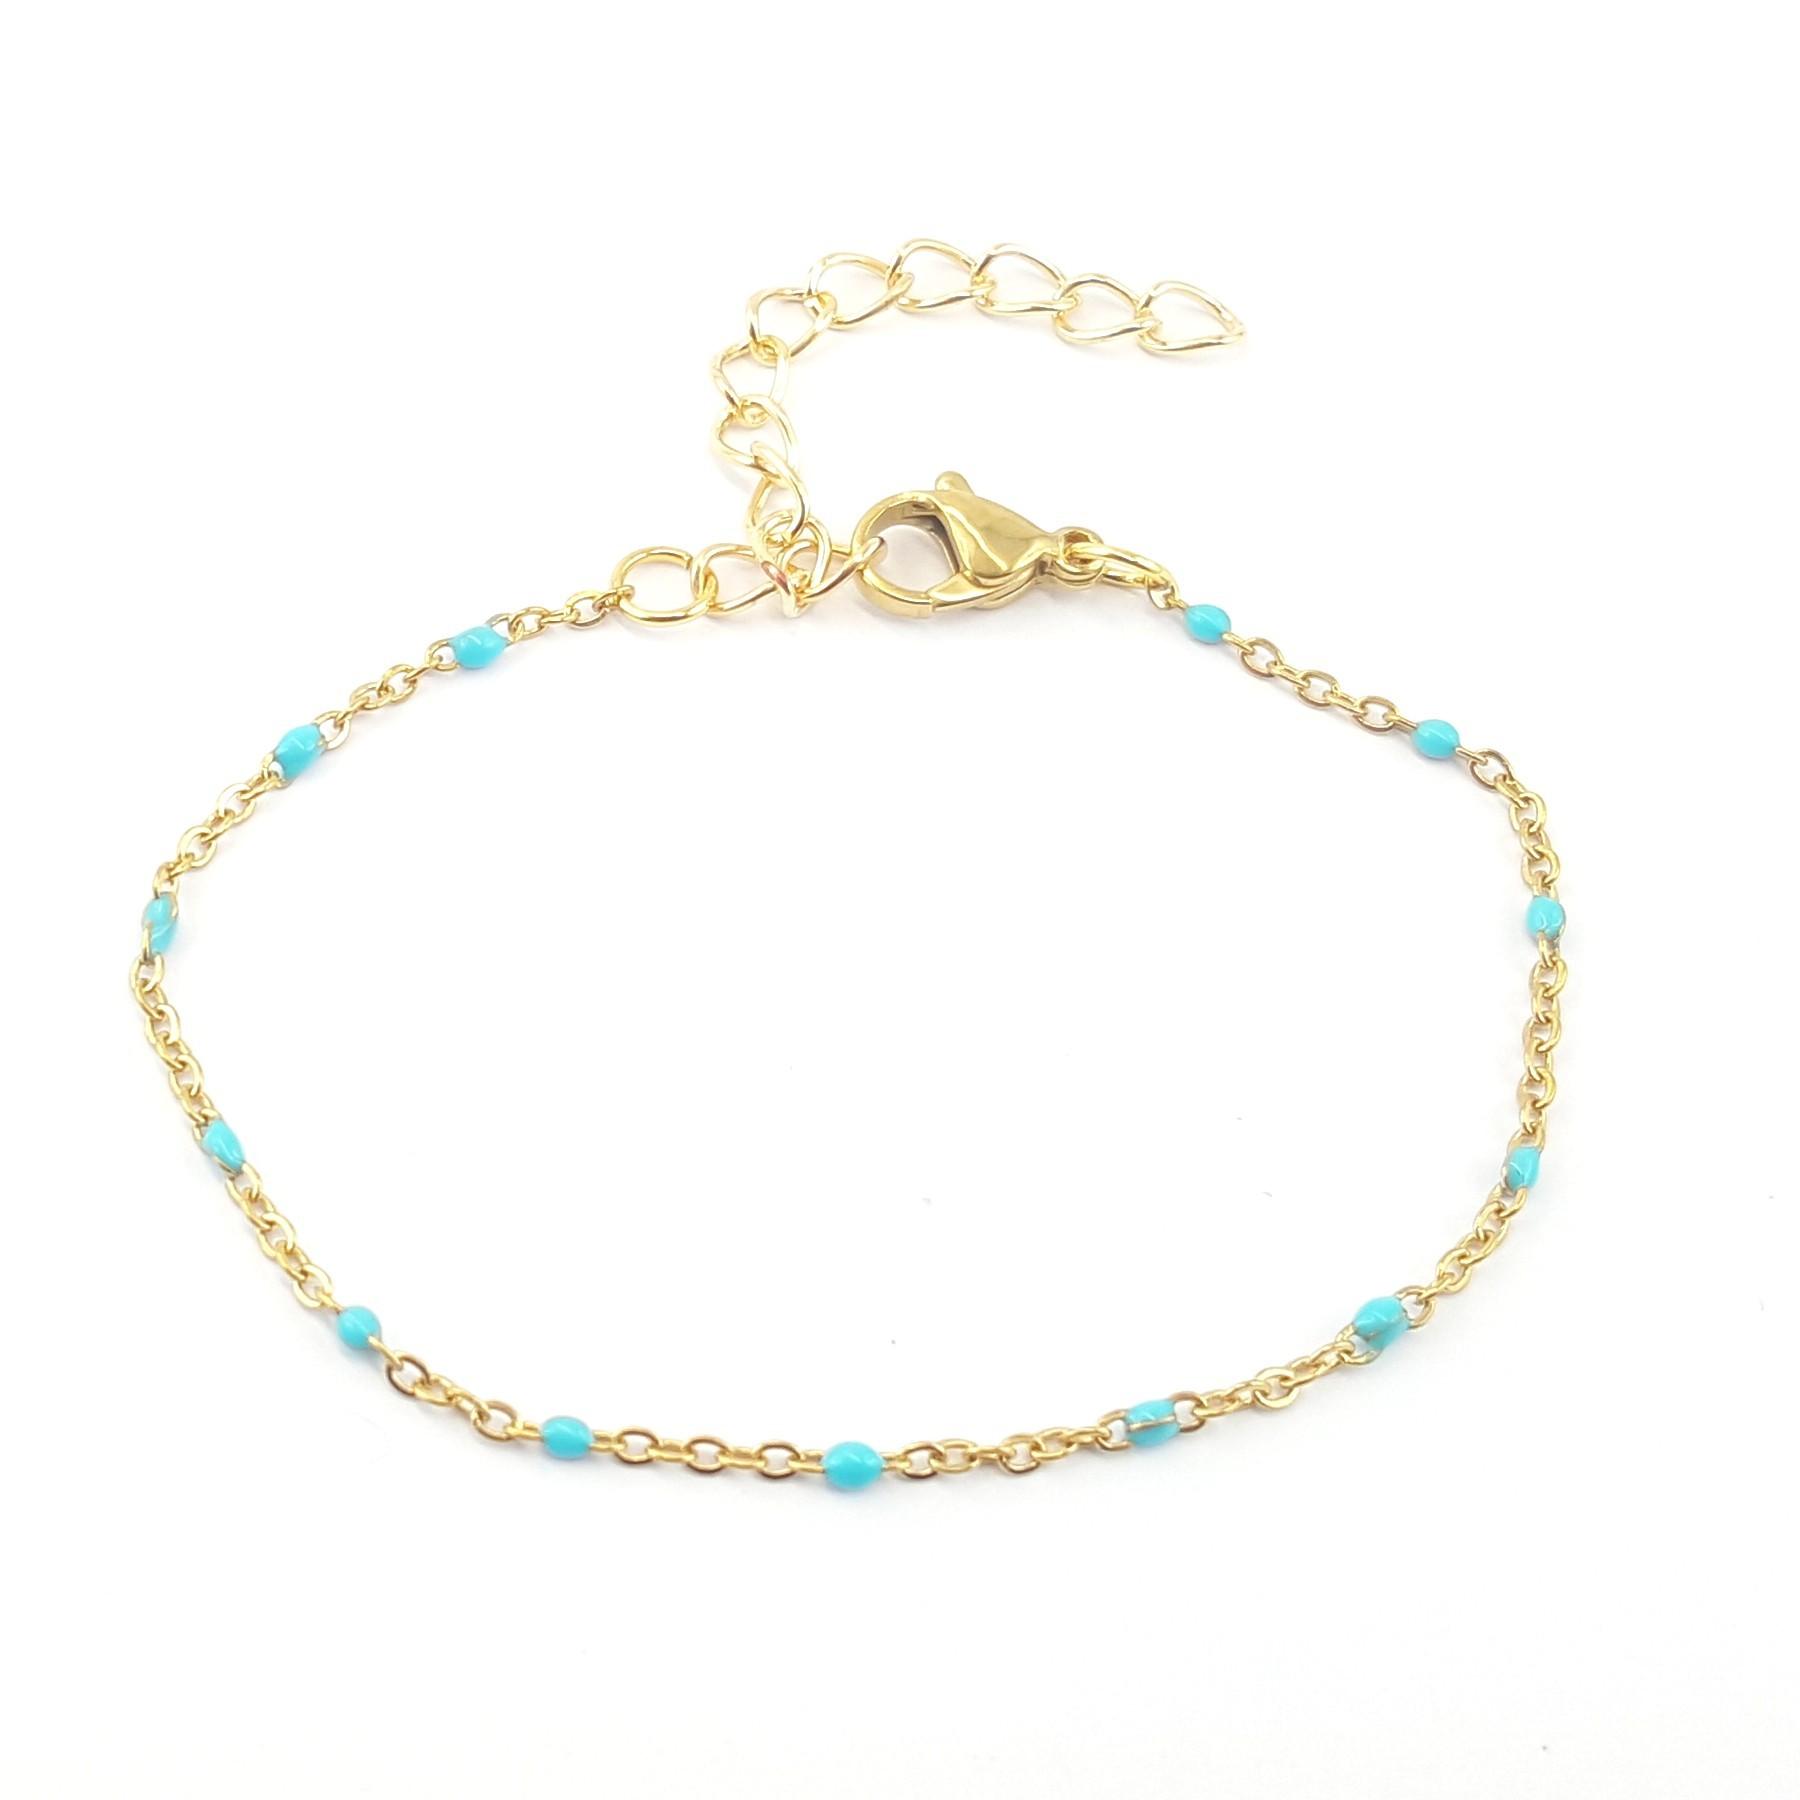 Bracelet émaillage turquoise